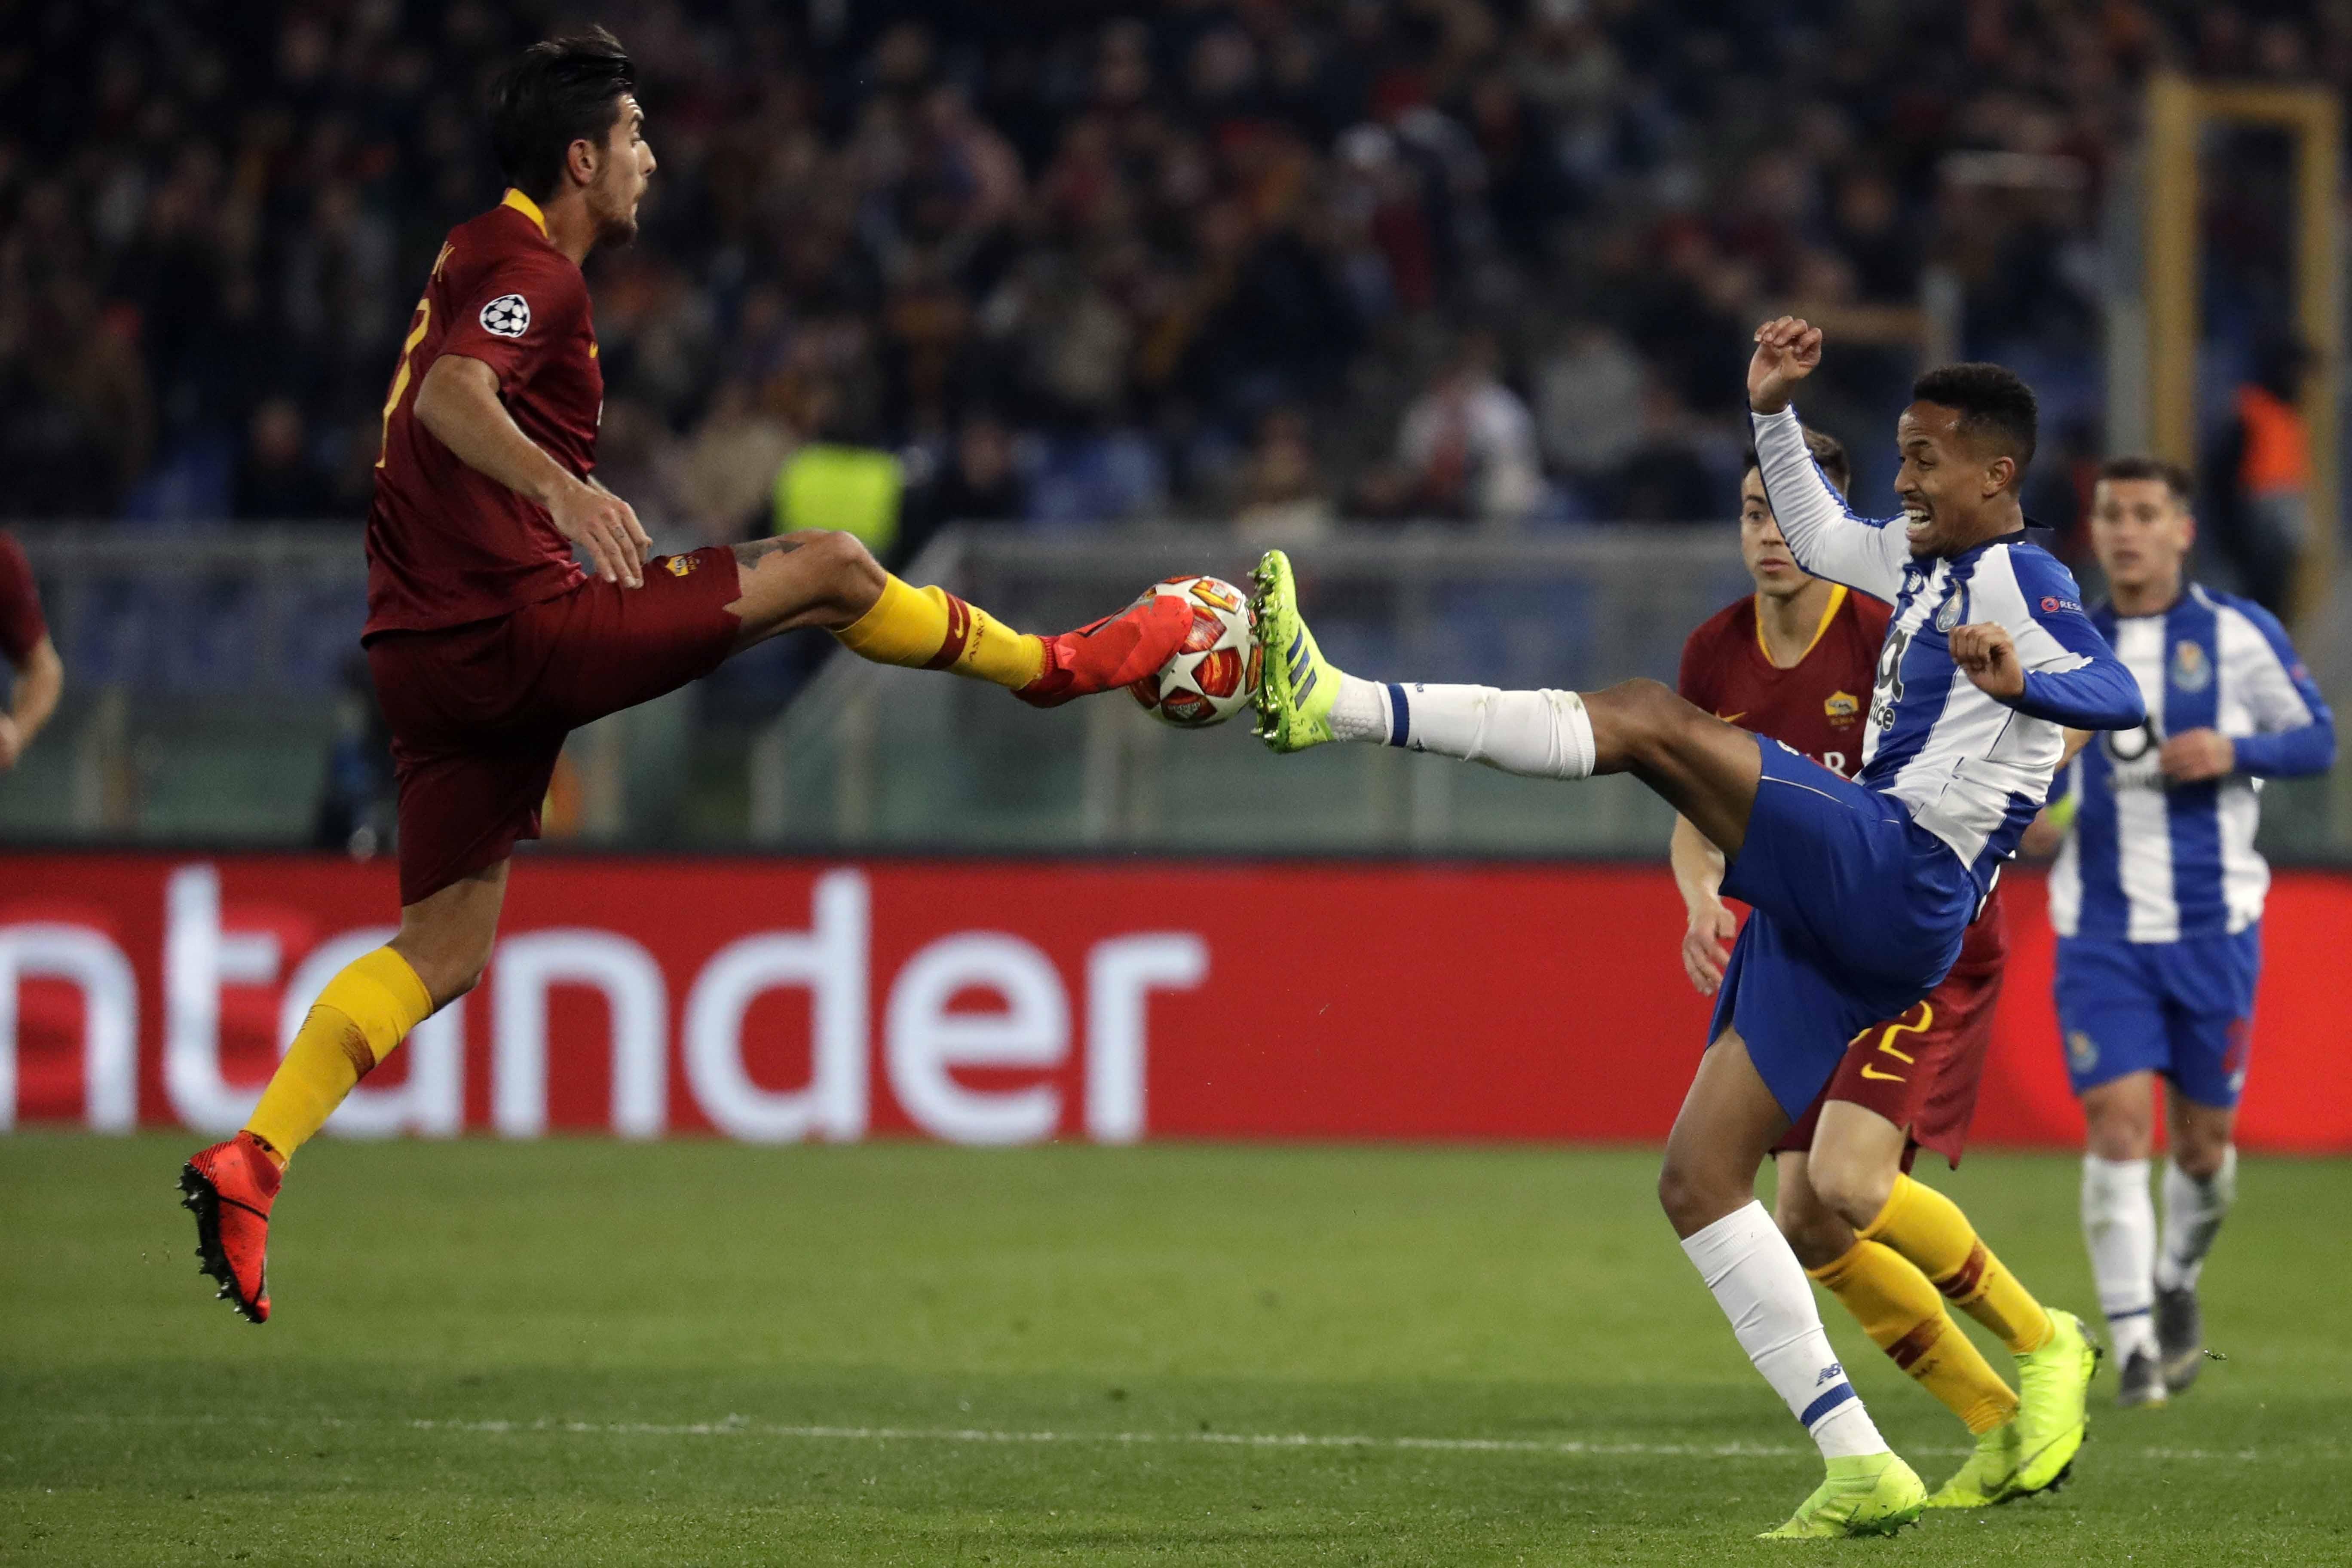 Zaniolo bags brace as Roma claim first-leg win over Porto